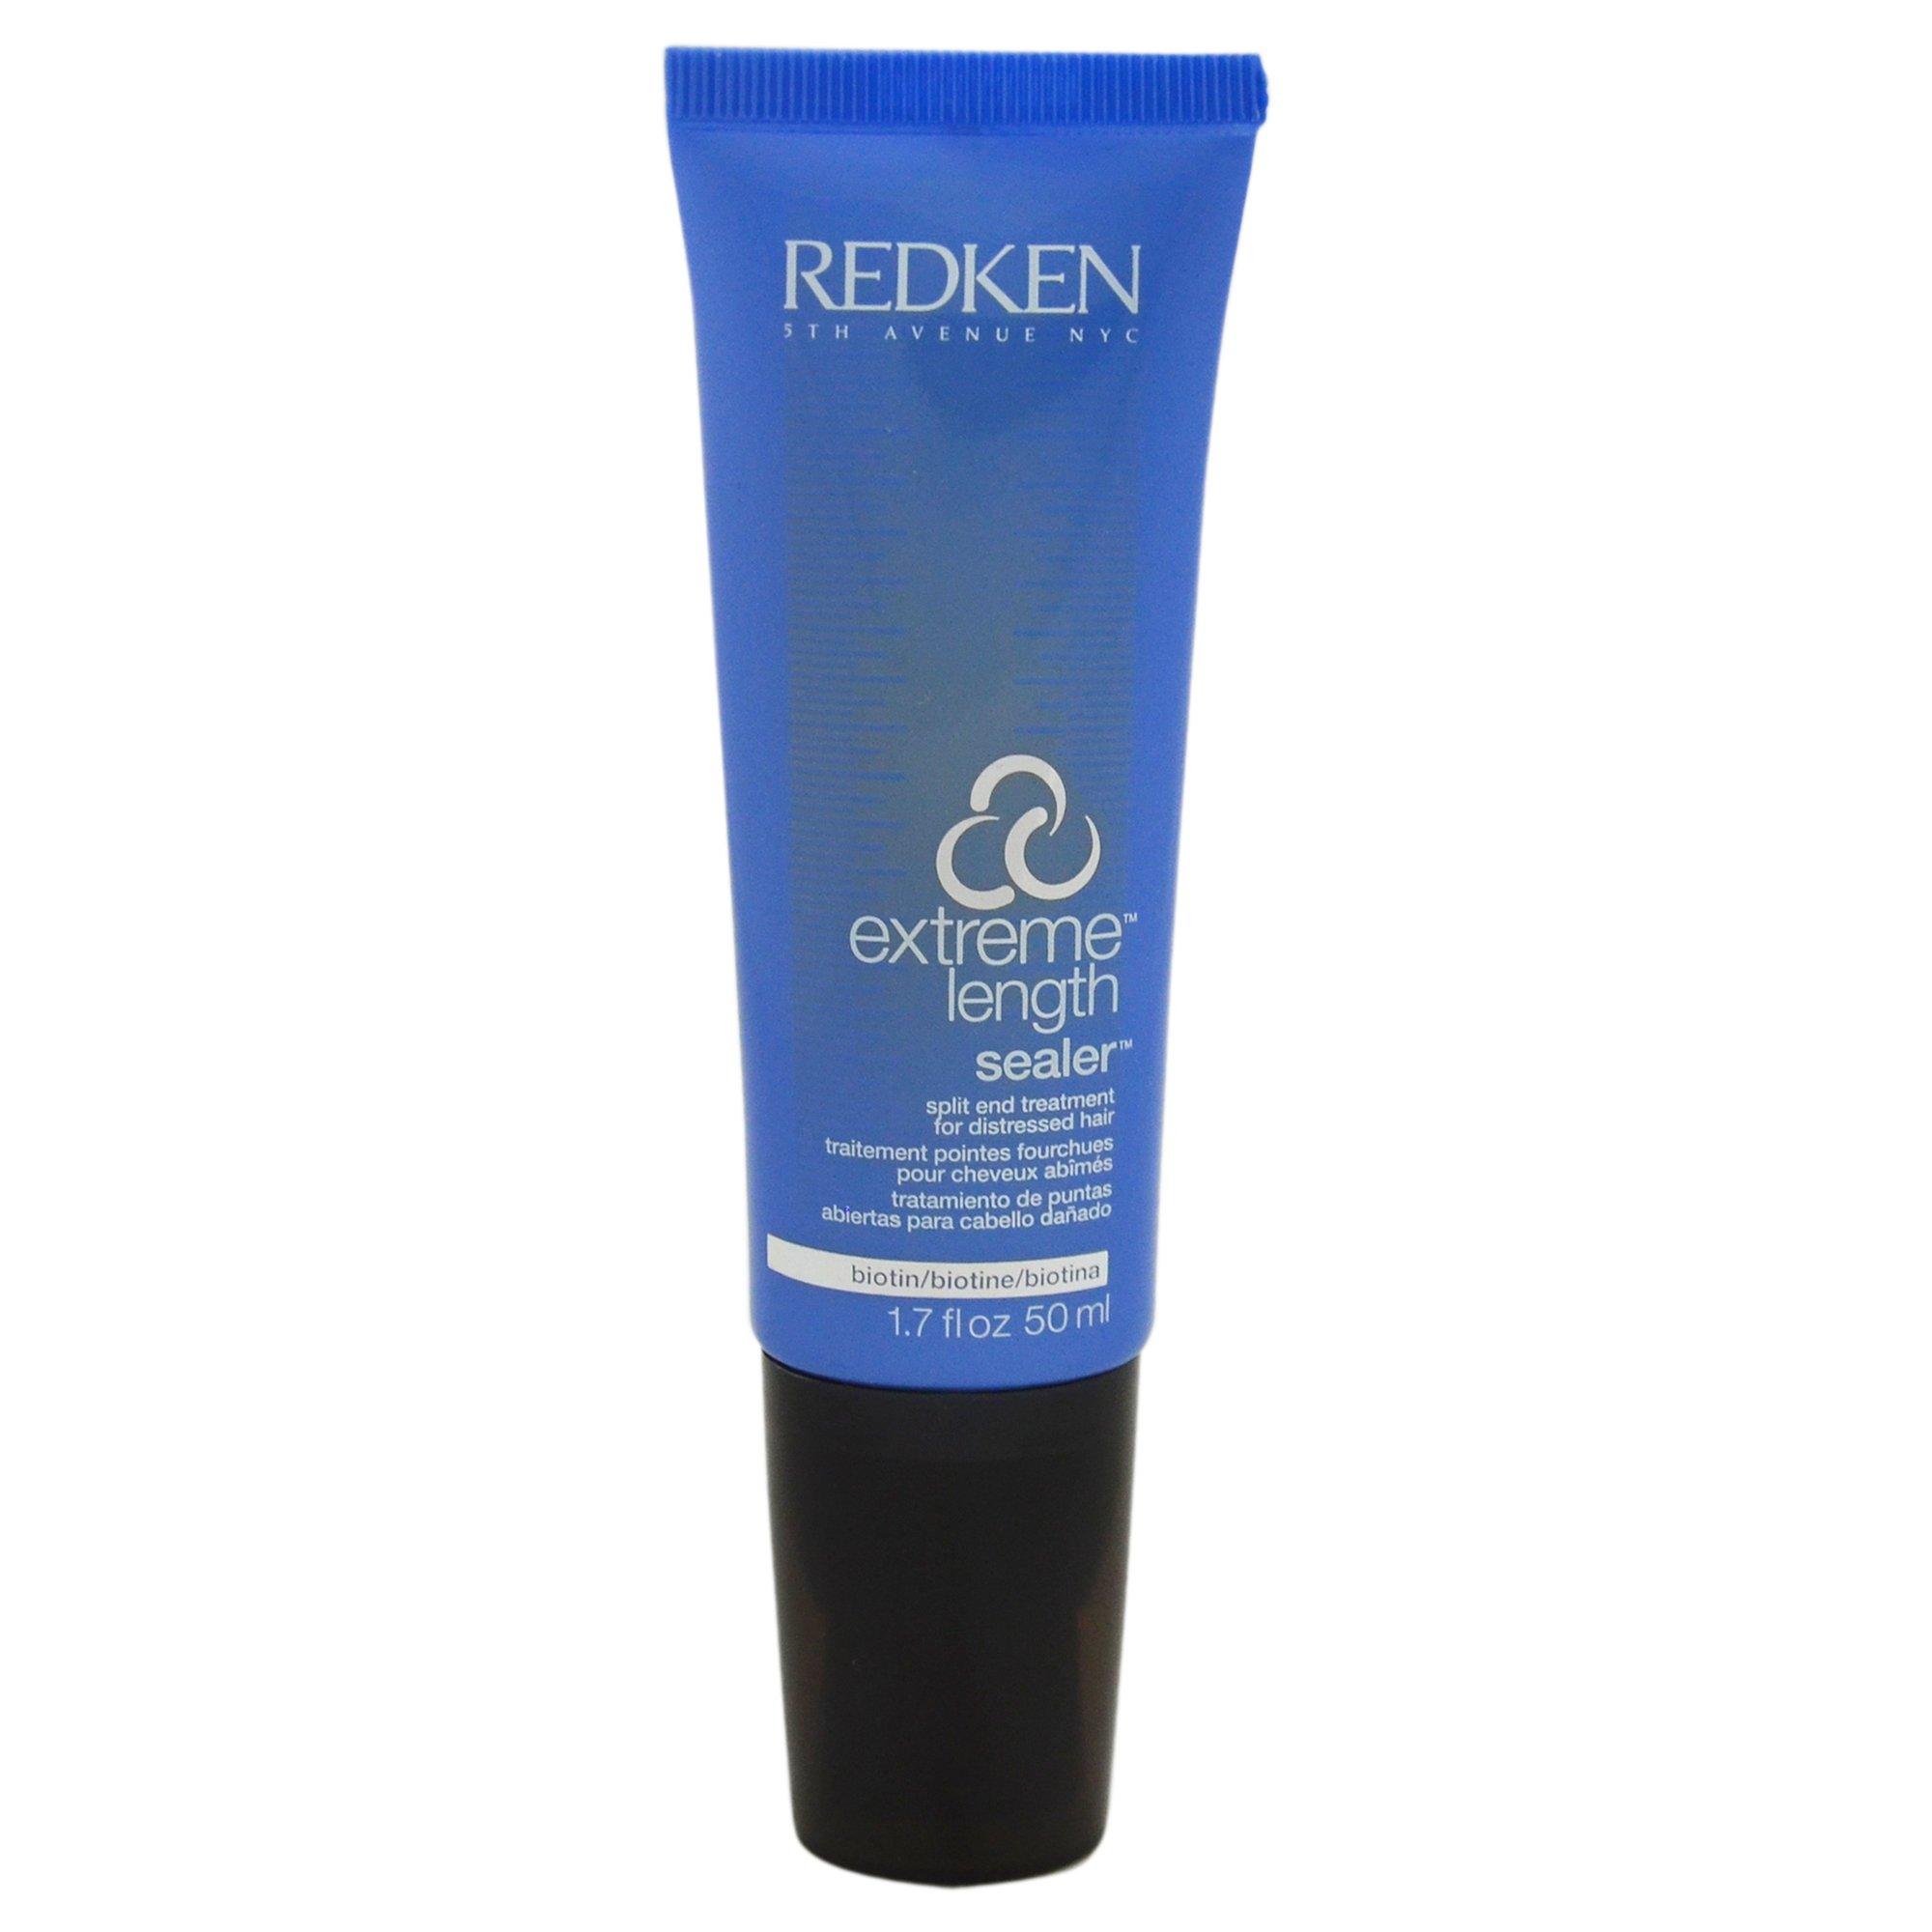 Redken Unisex Extreme Length Sealer Treatment, 1.7 Ounce